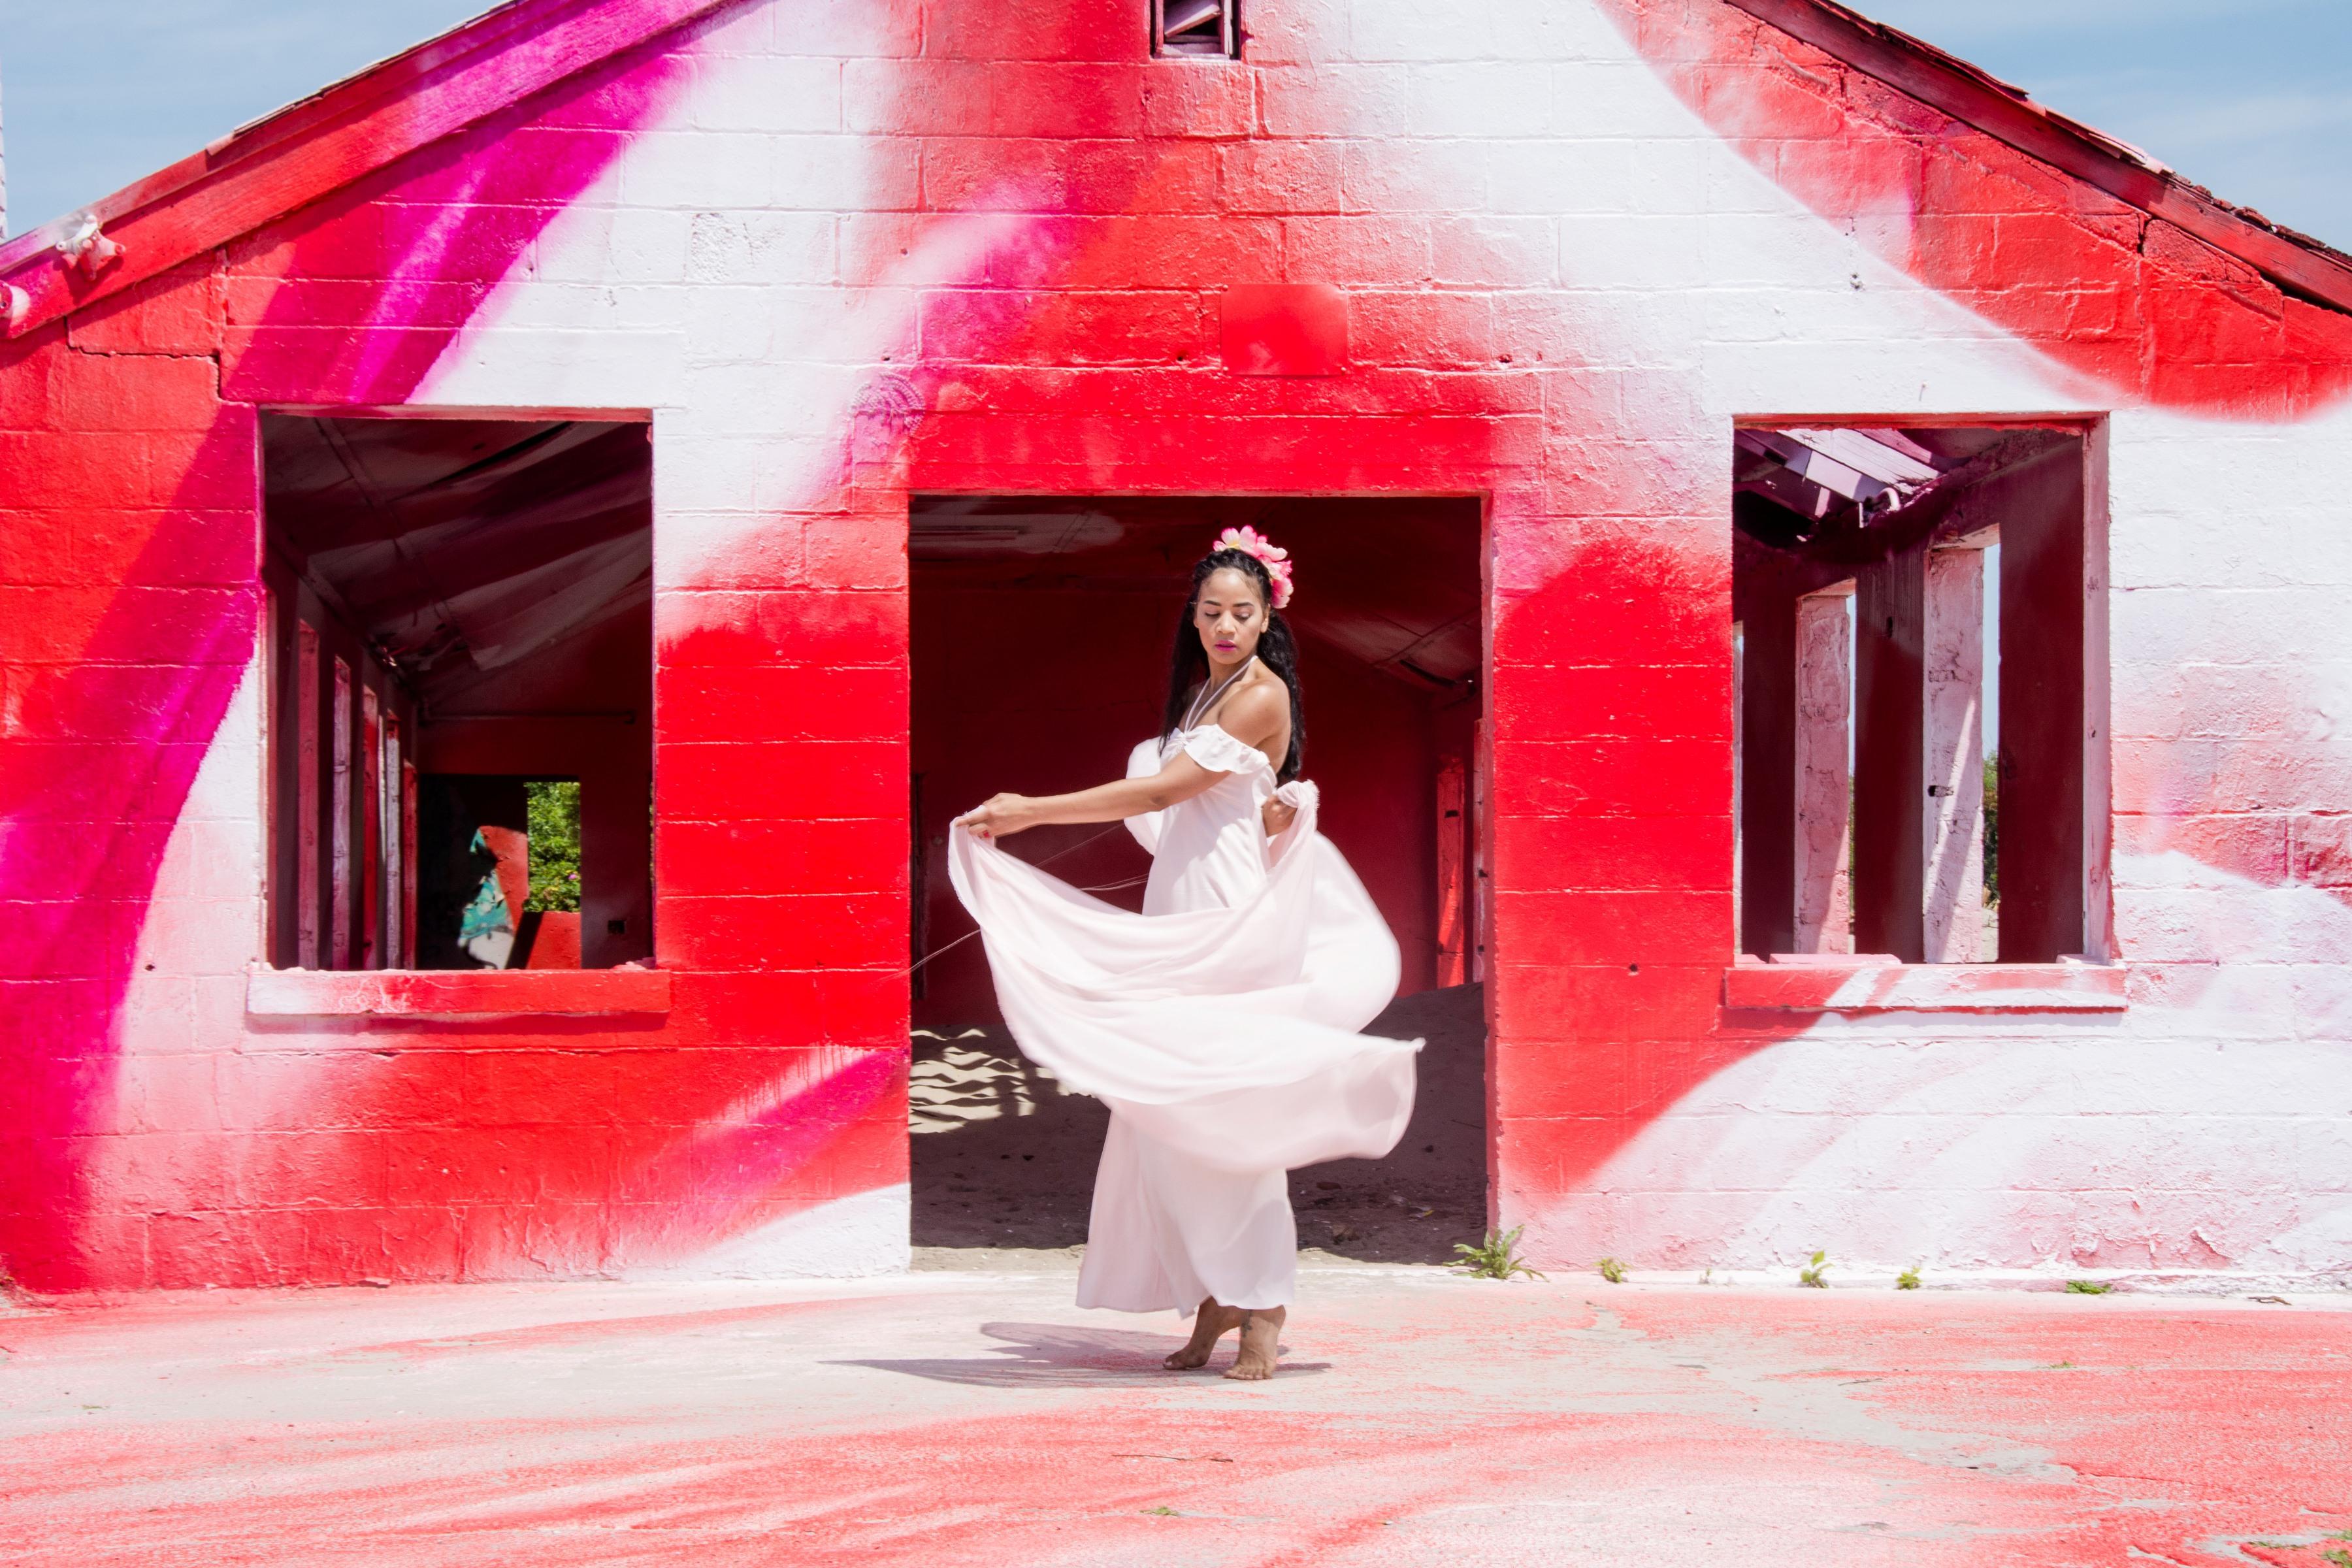 moma-ps1_rockaway_katharina-grosse_-the-stylish-flaneuse_-public-art_-fort-tilden_1